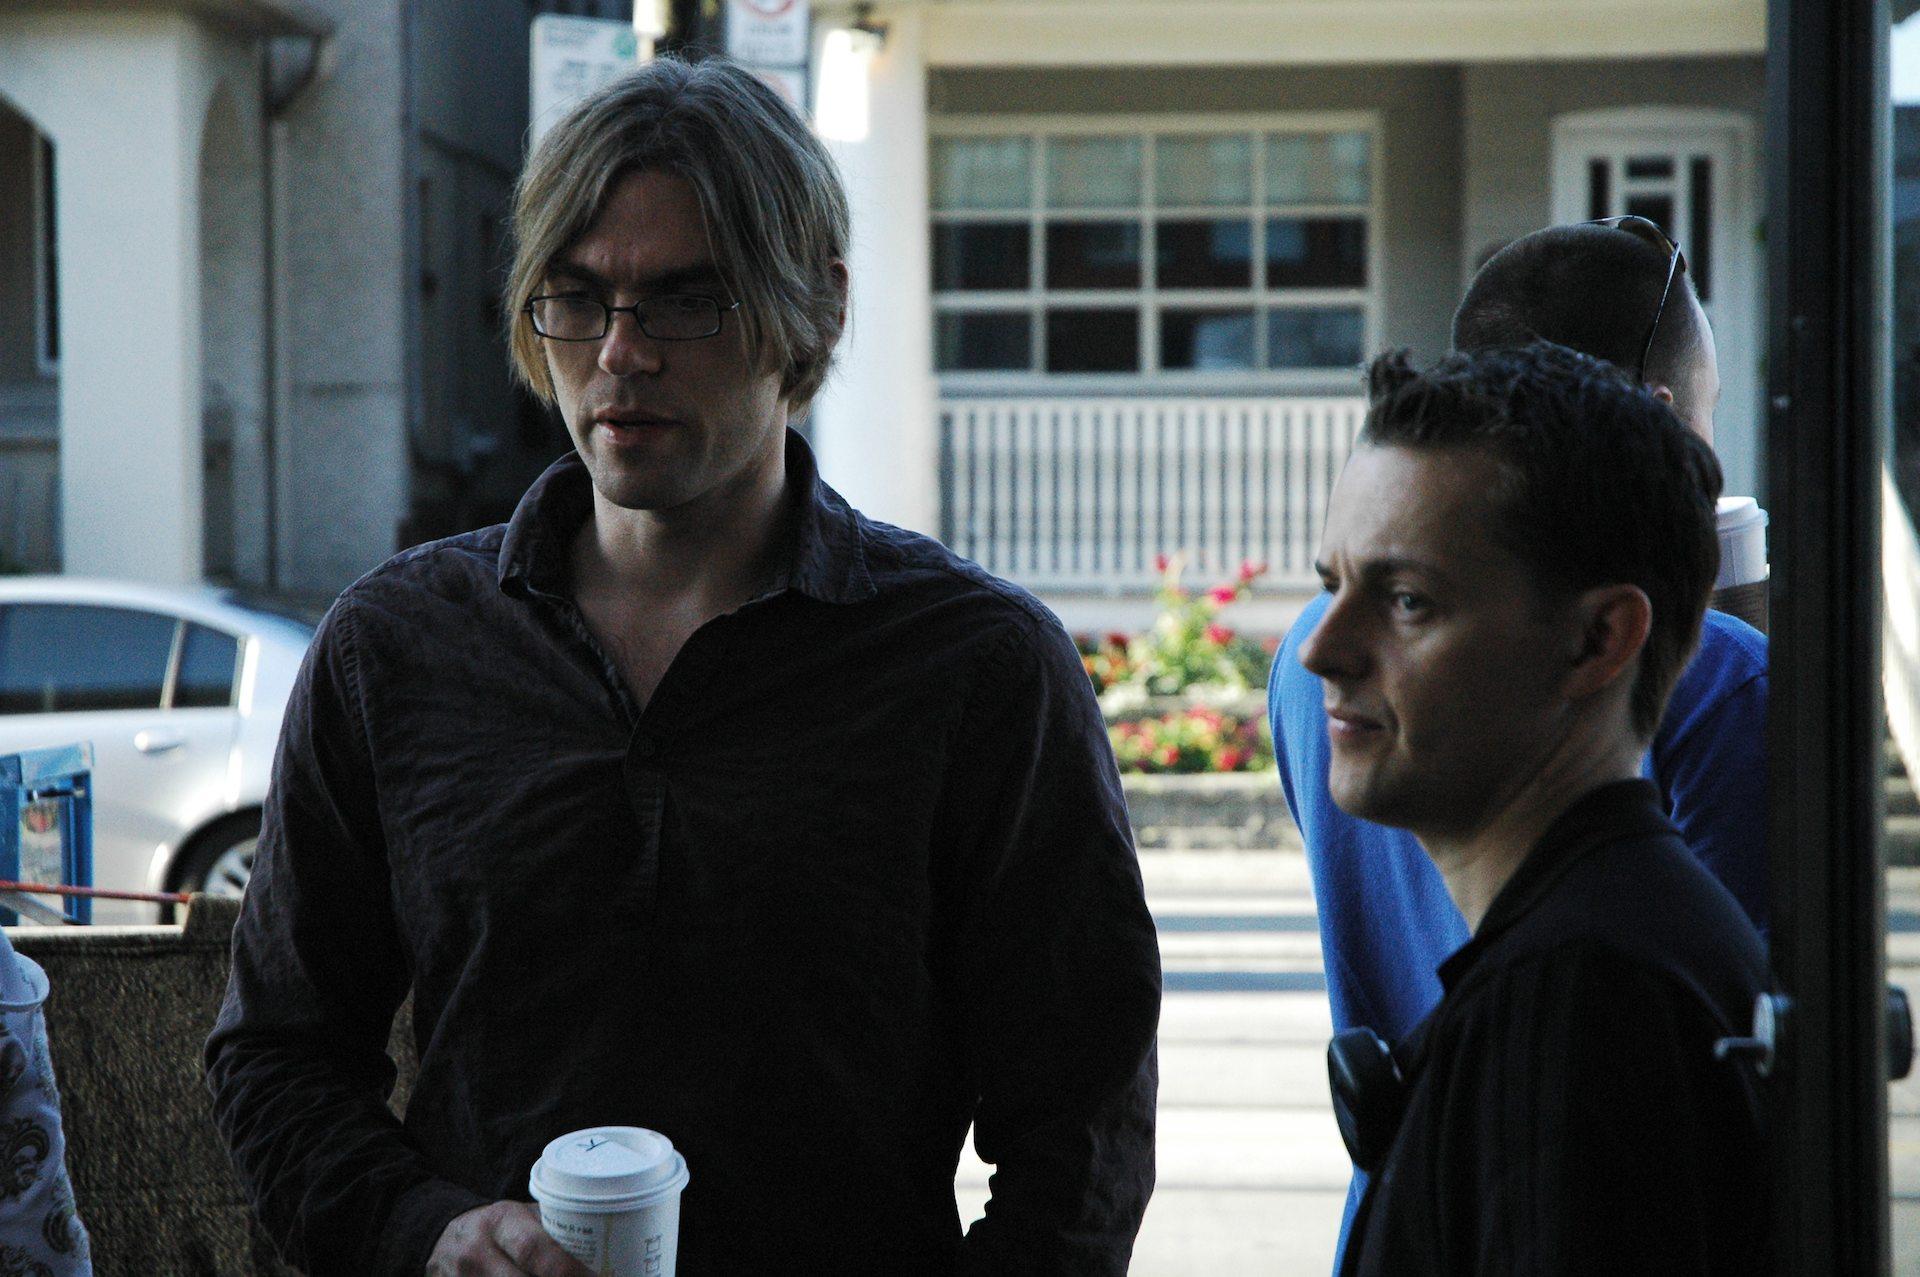 Director, Ken Simpson & Producer, Alex Jordan